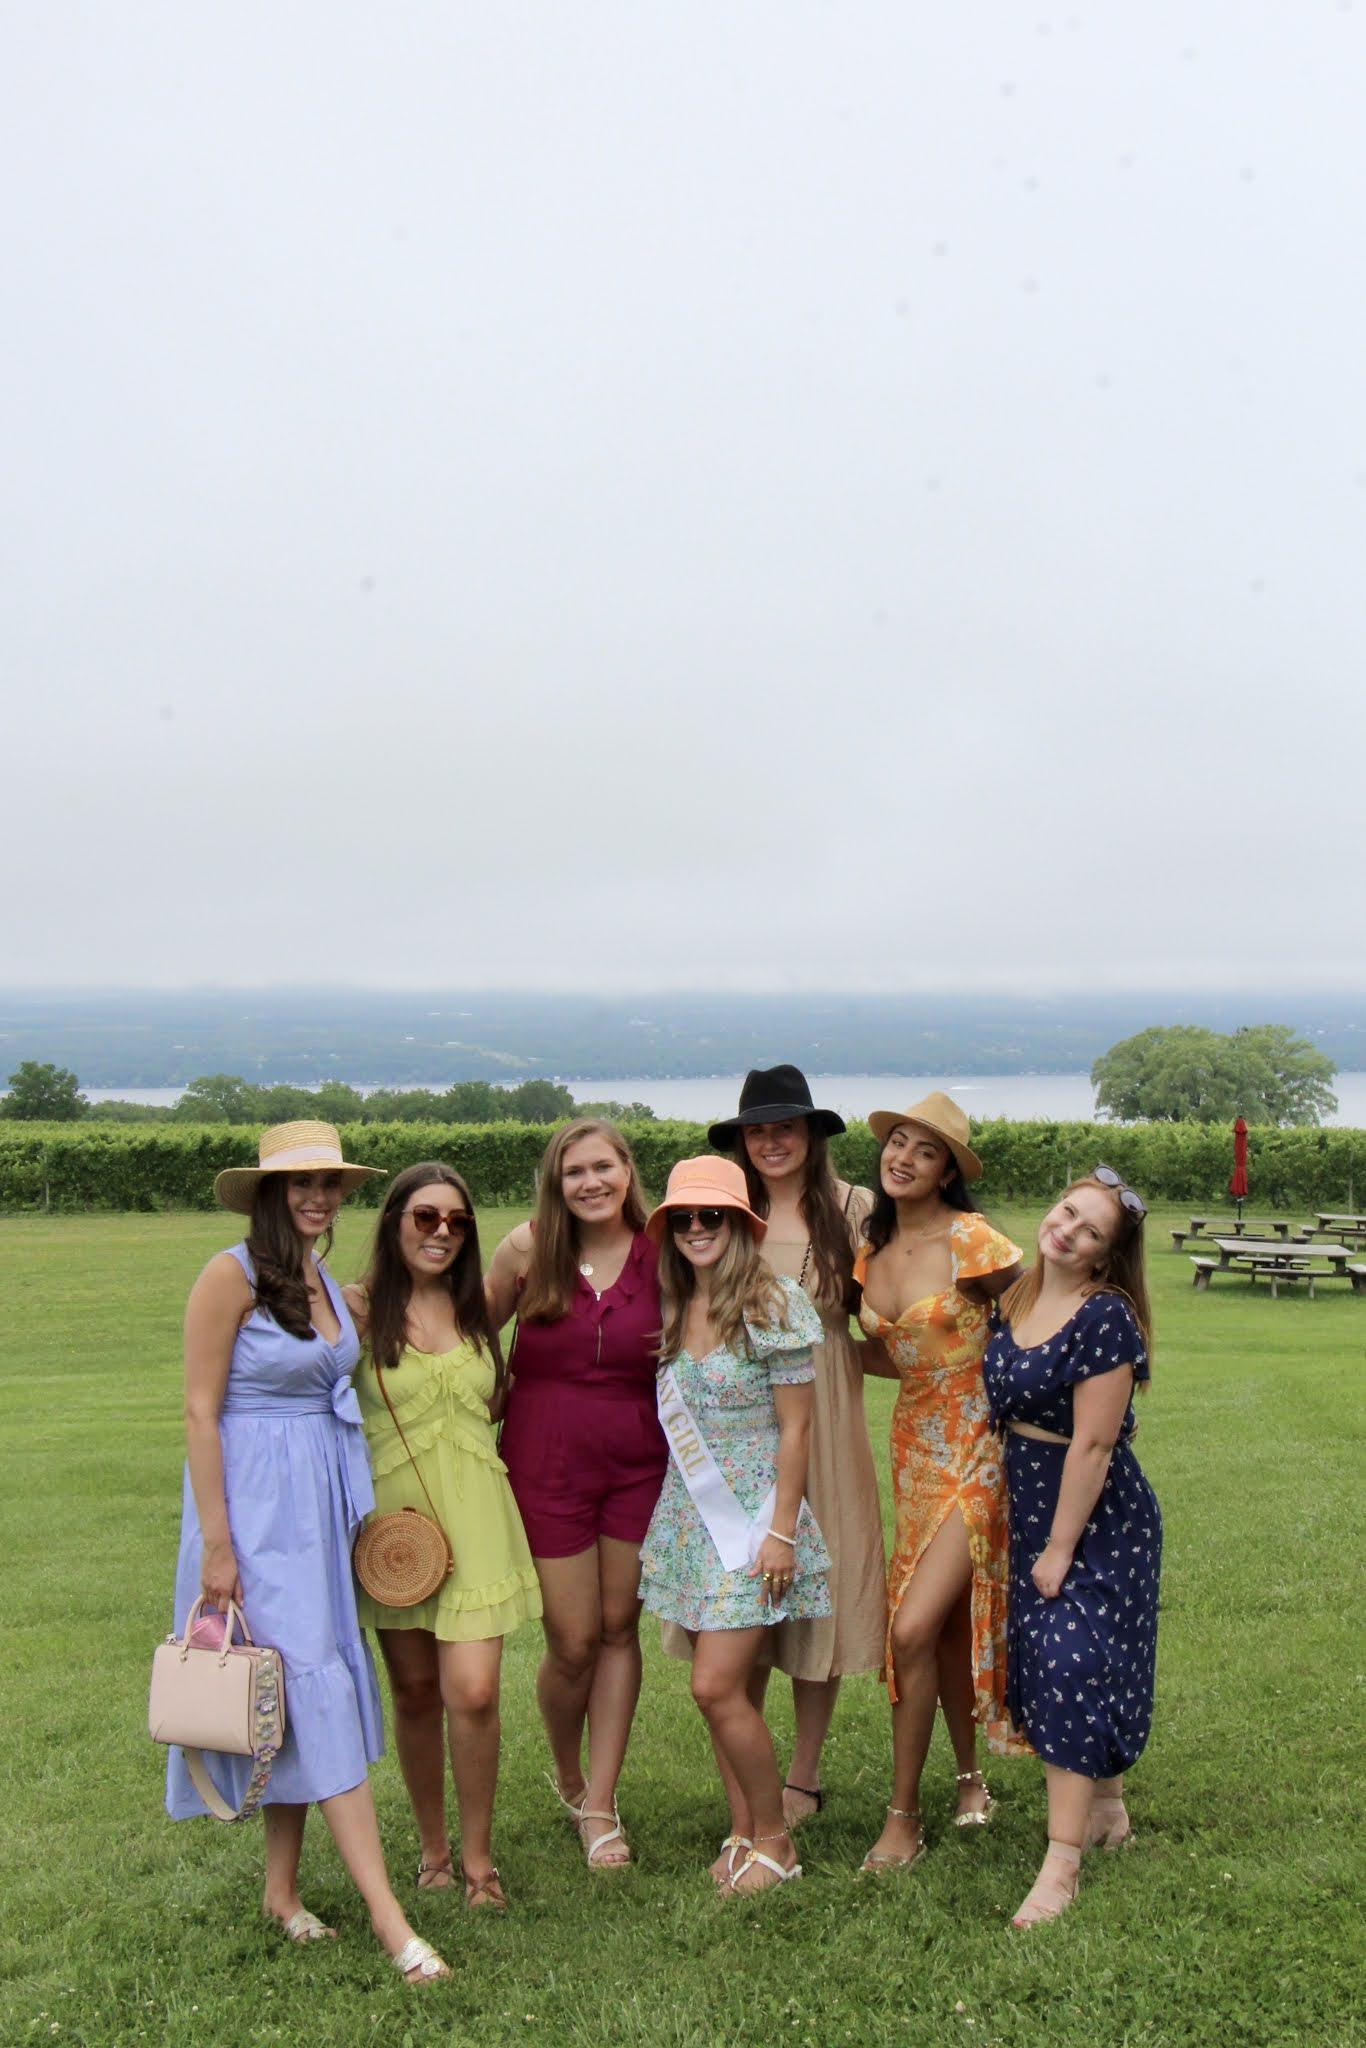 wagner, vineyards, new york, upstate new york, finger lakes, vineyard, wine tour